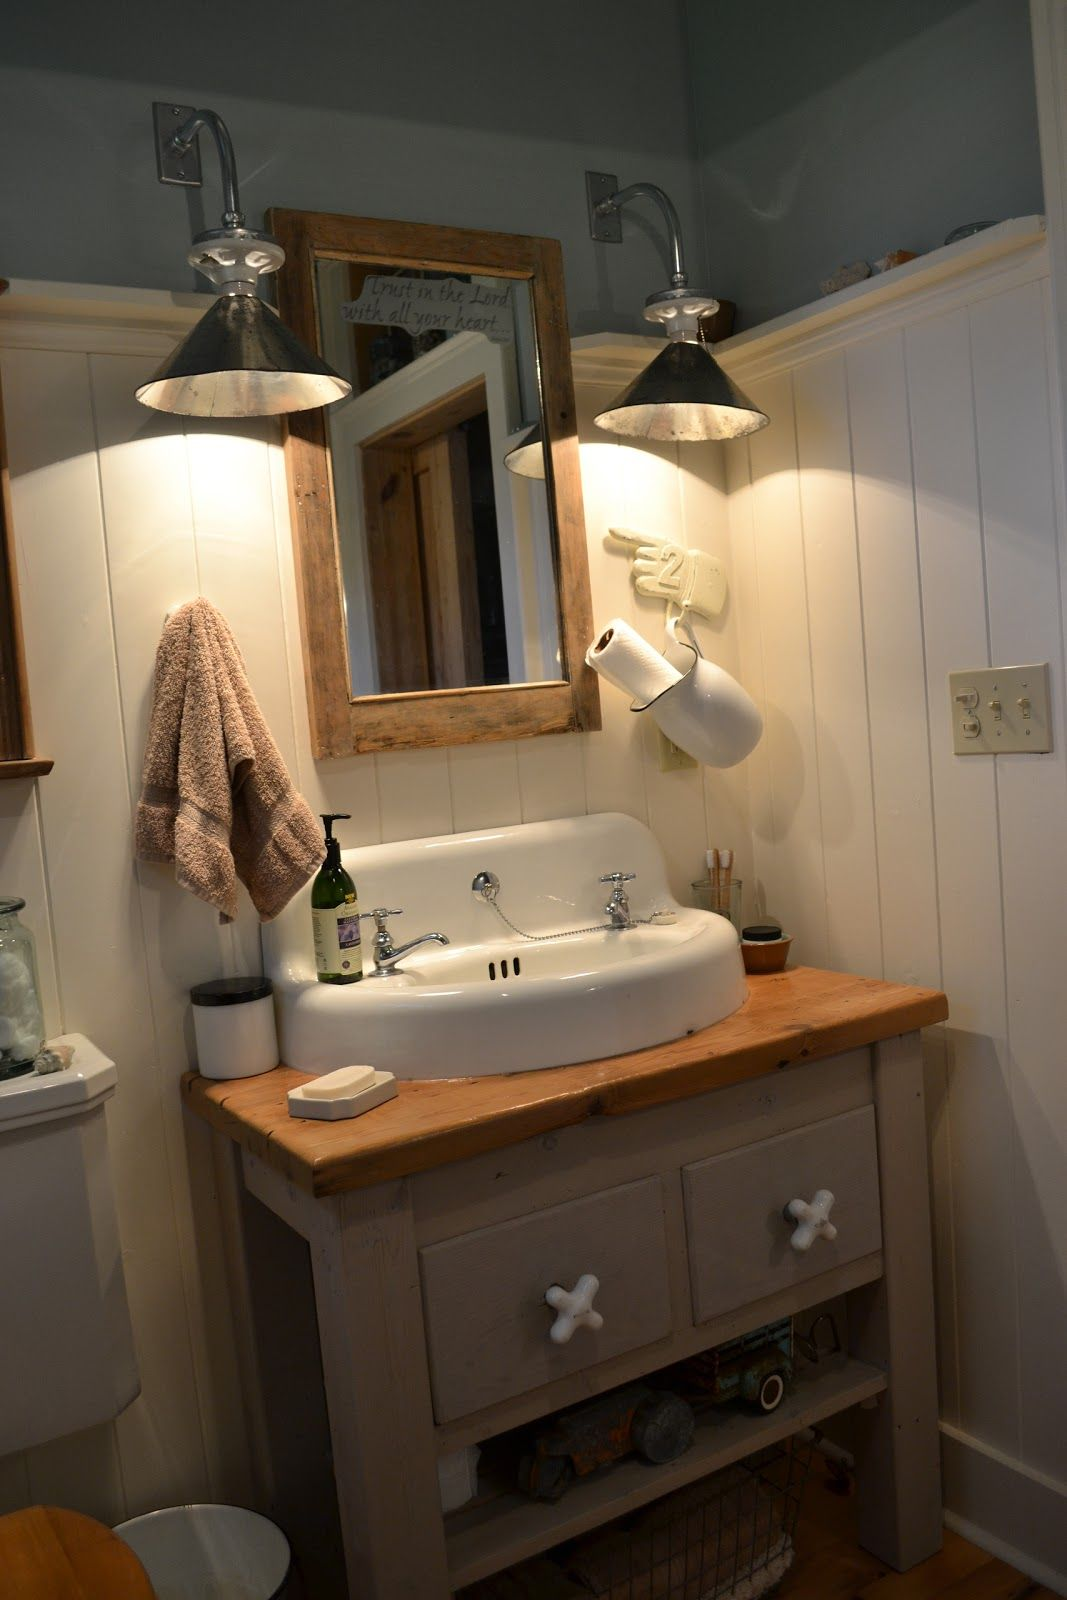 Primitive bathrooms - The 1829 Farmhouse Farmhouse Tour Bathroom Farmhouse Bathroomsprimitive